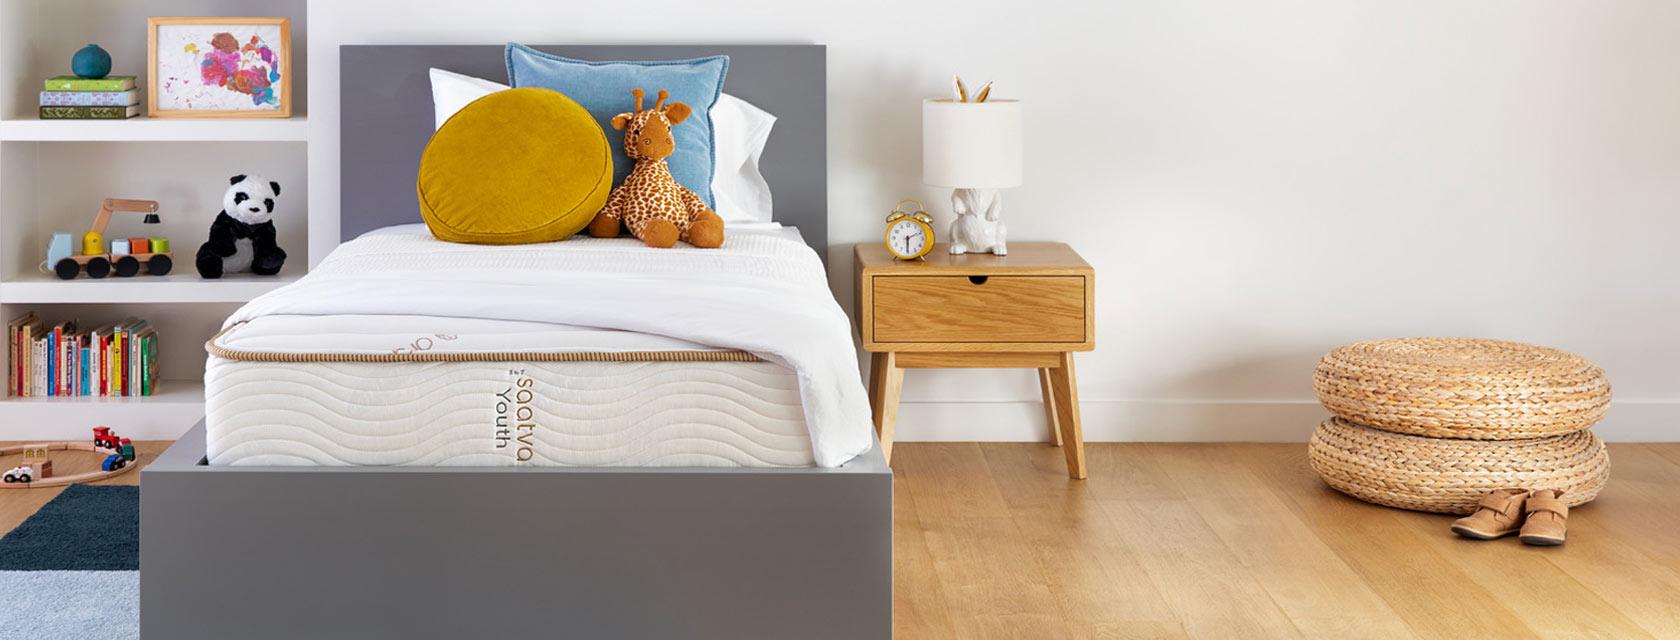 saatva youth mattress review